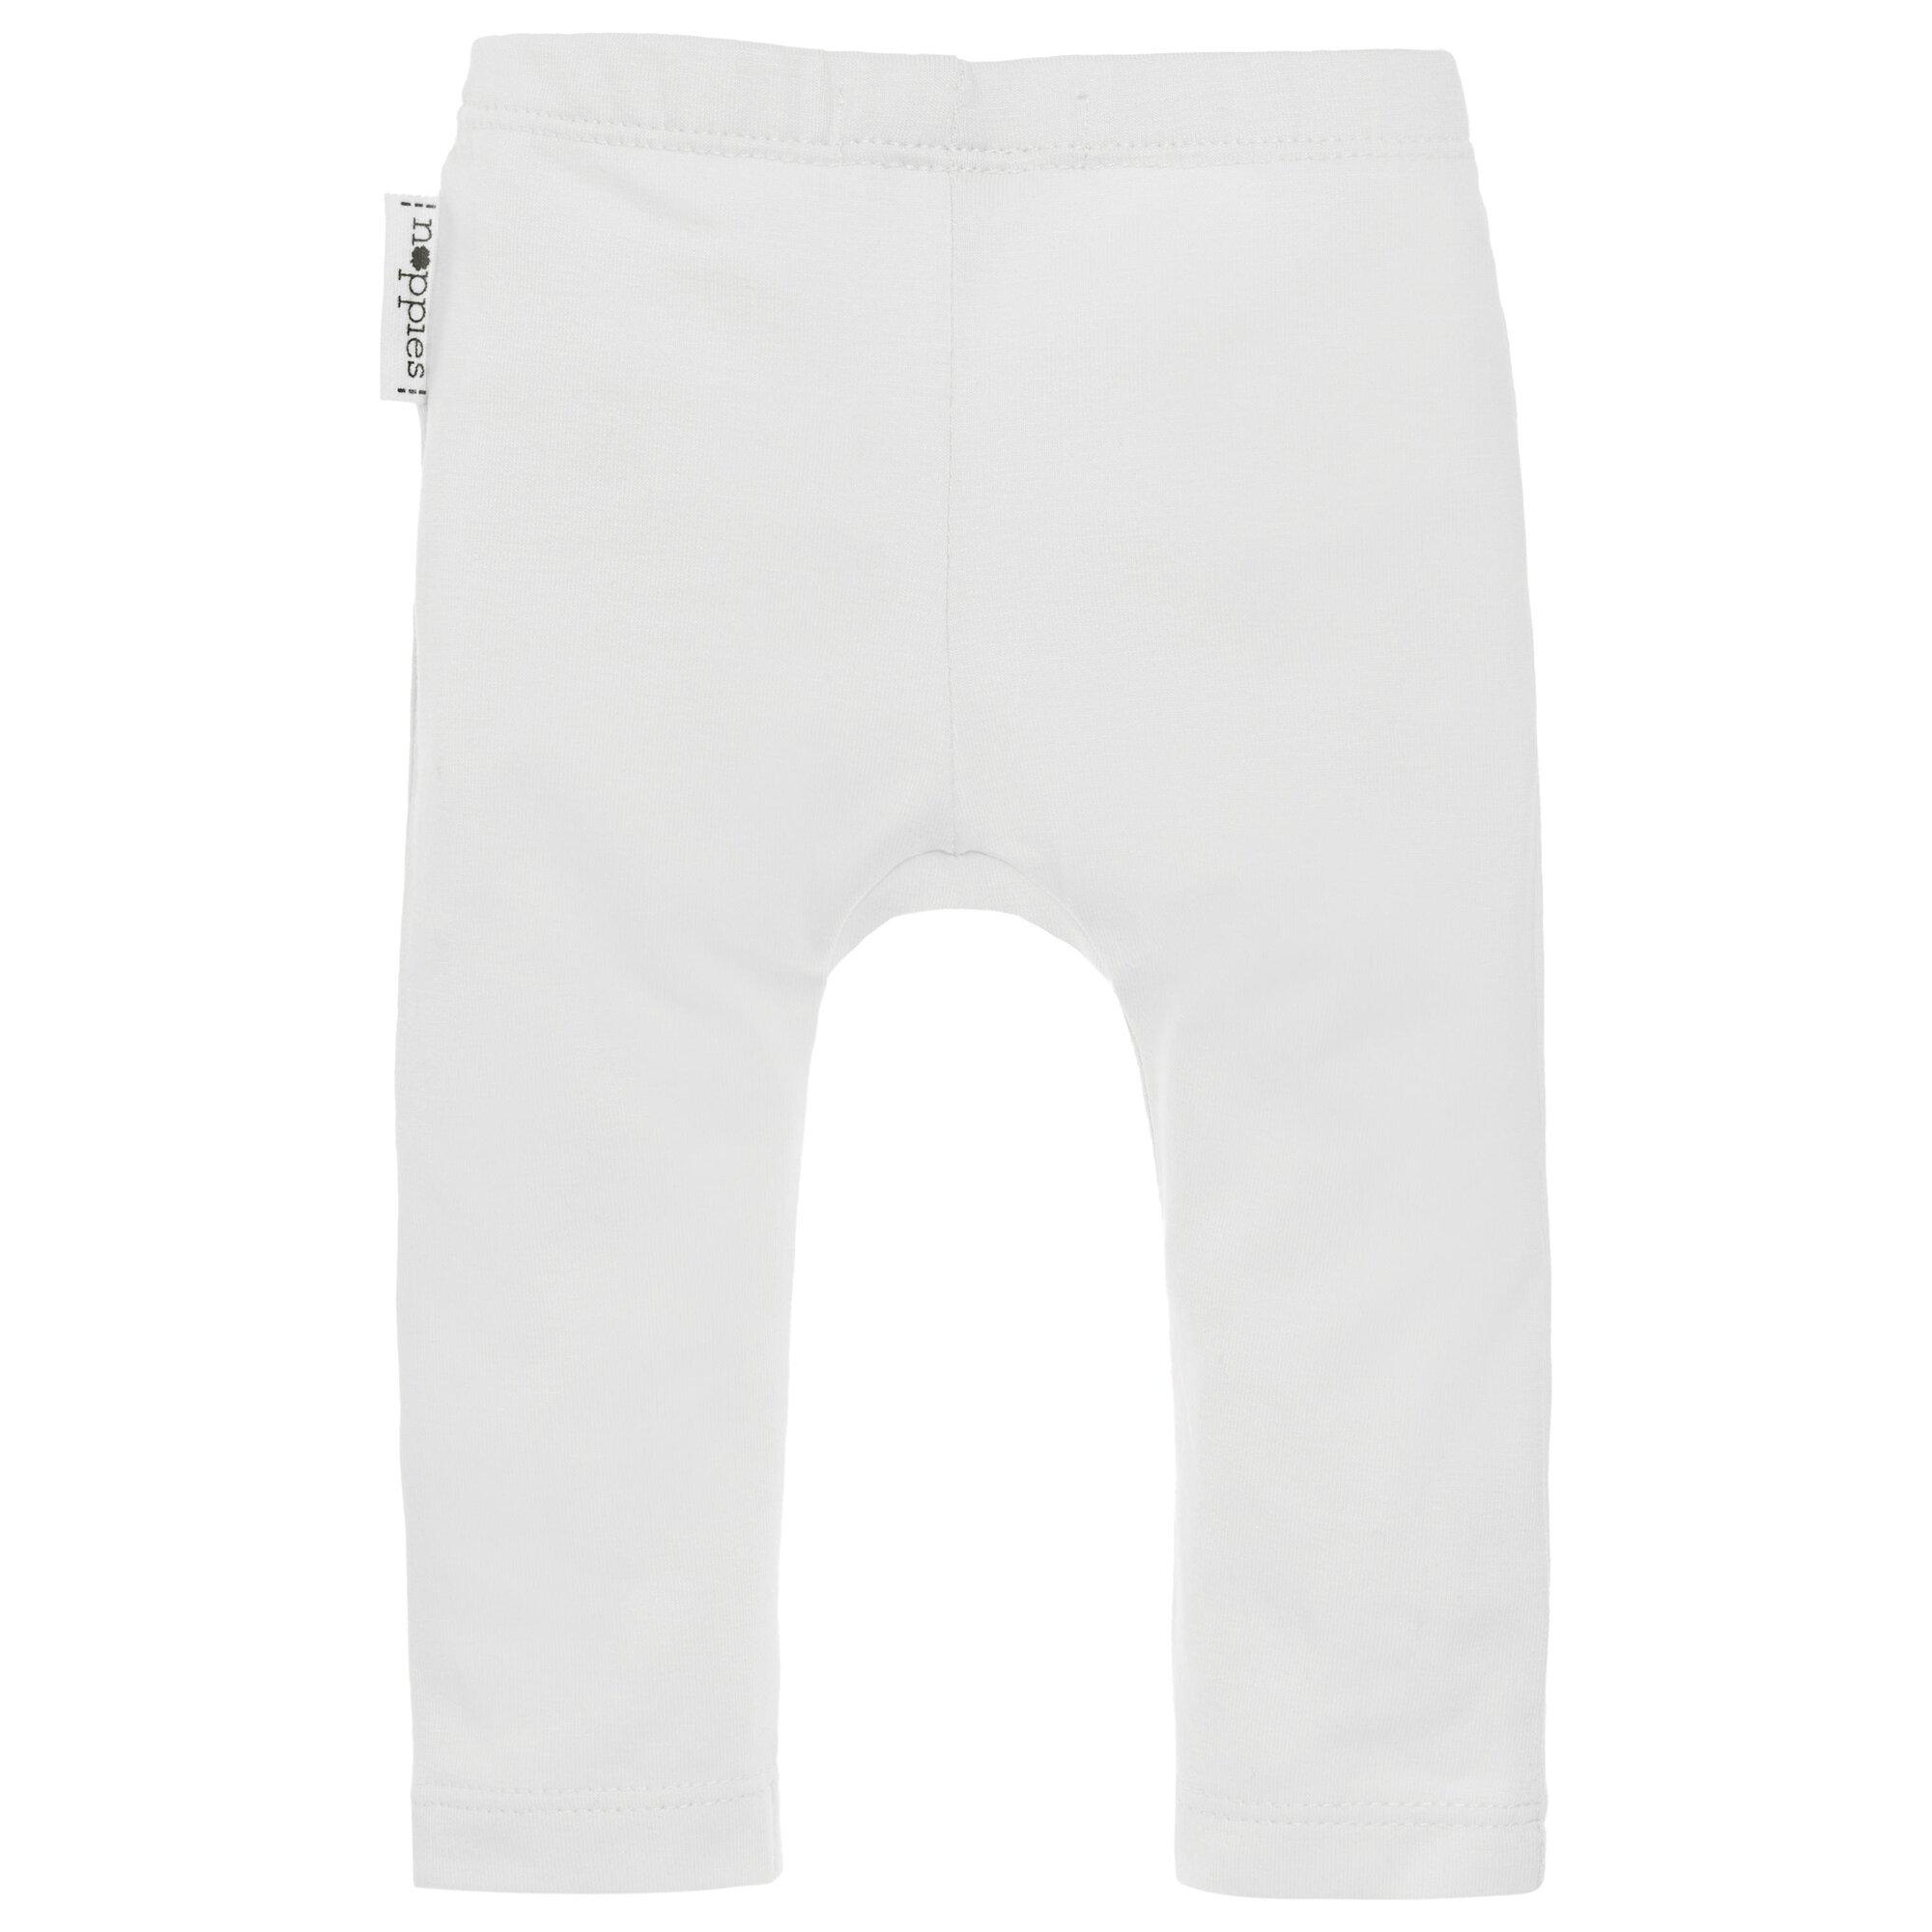 noppies-leggings-angie, 9.99 EUR @ babywalz-de